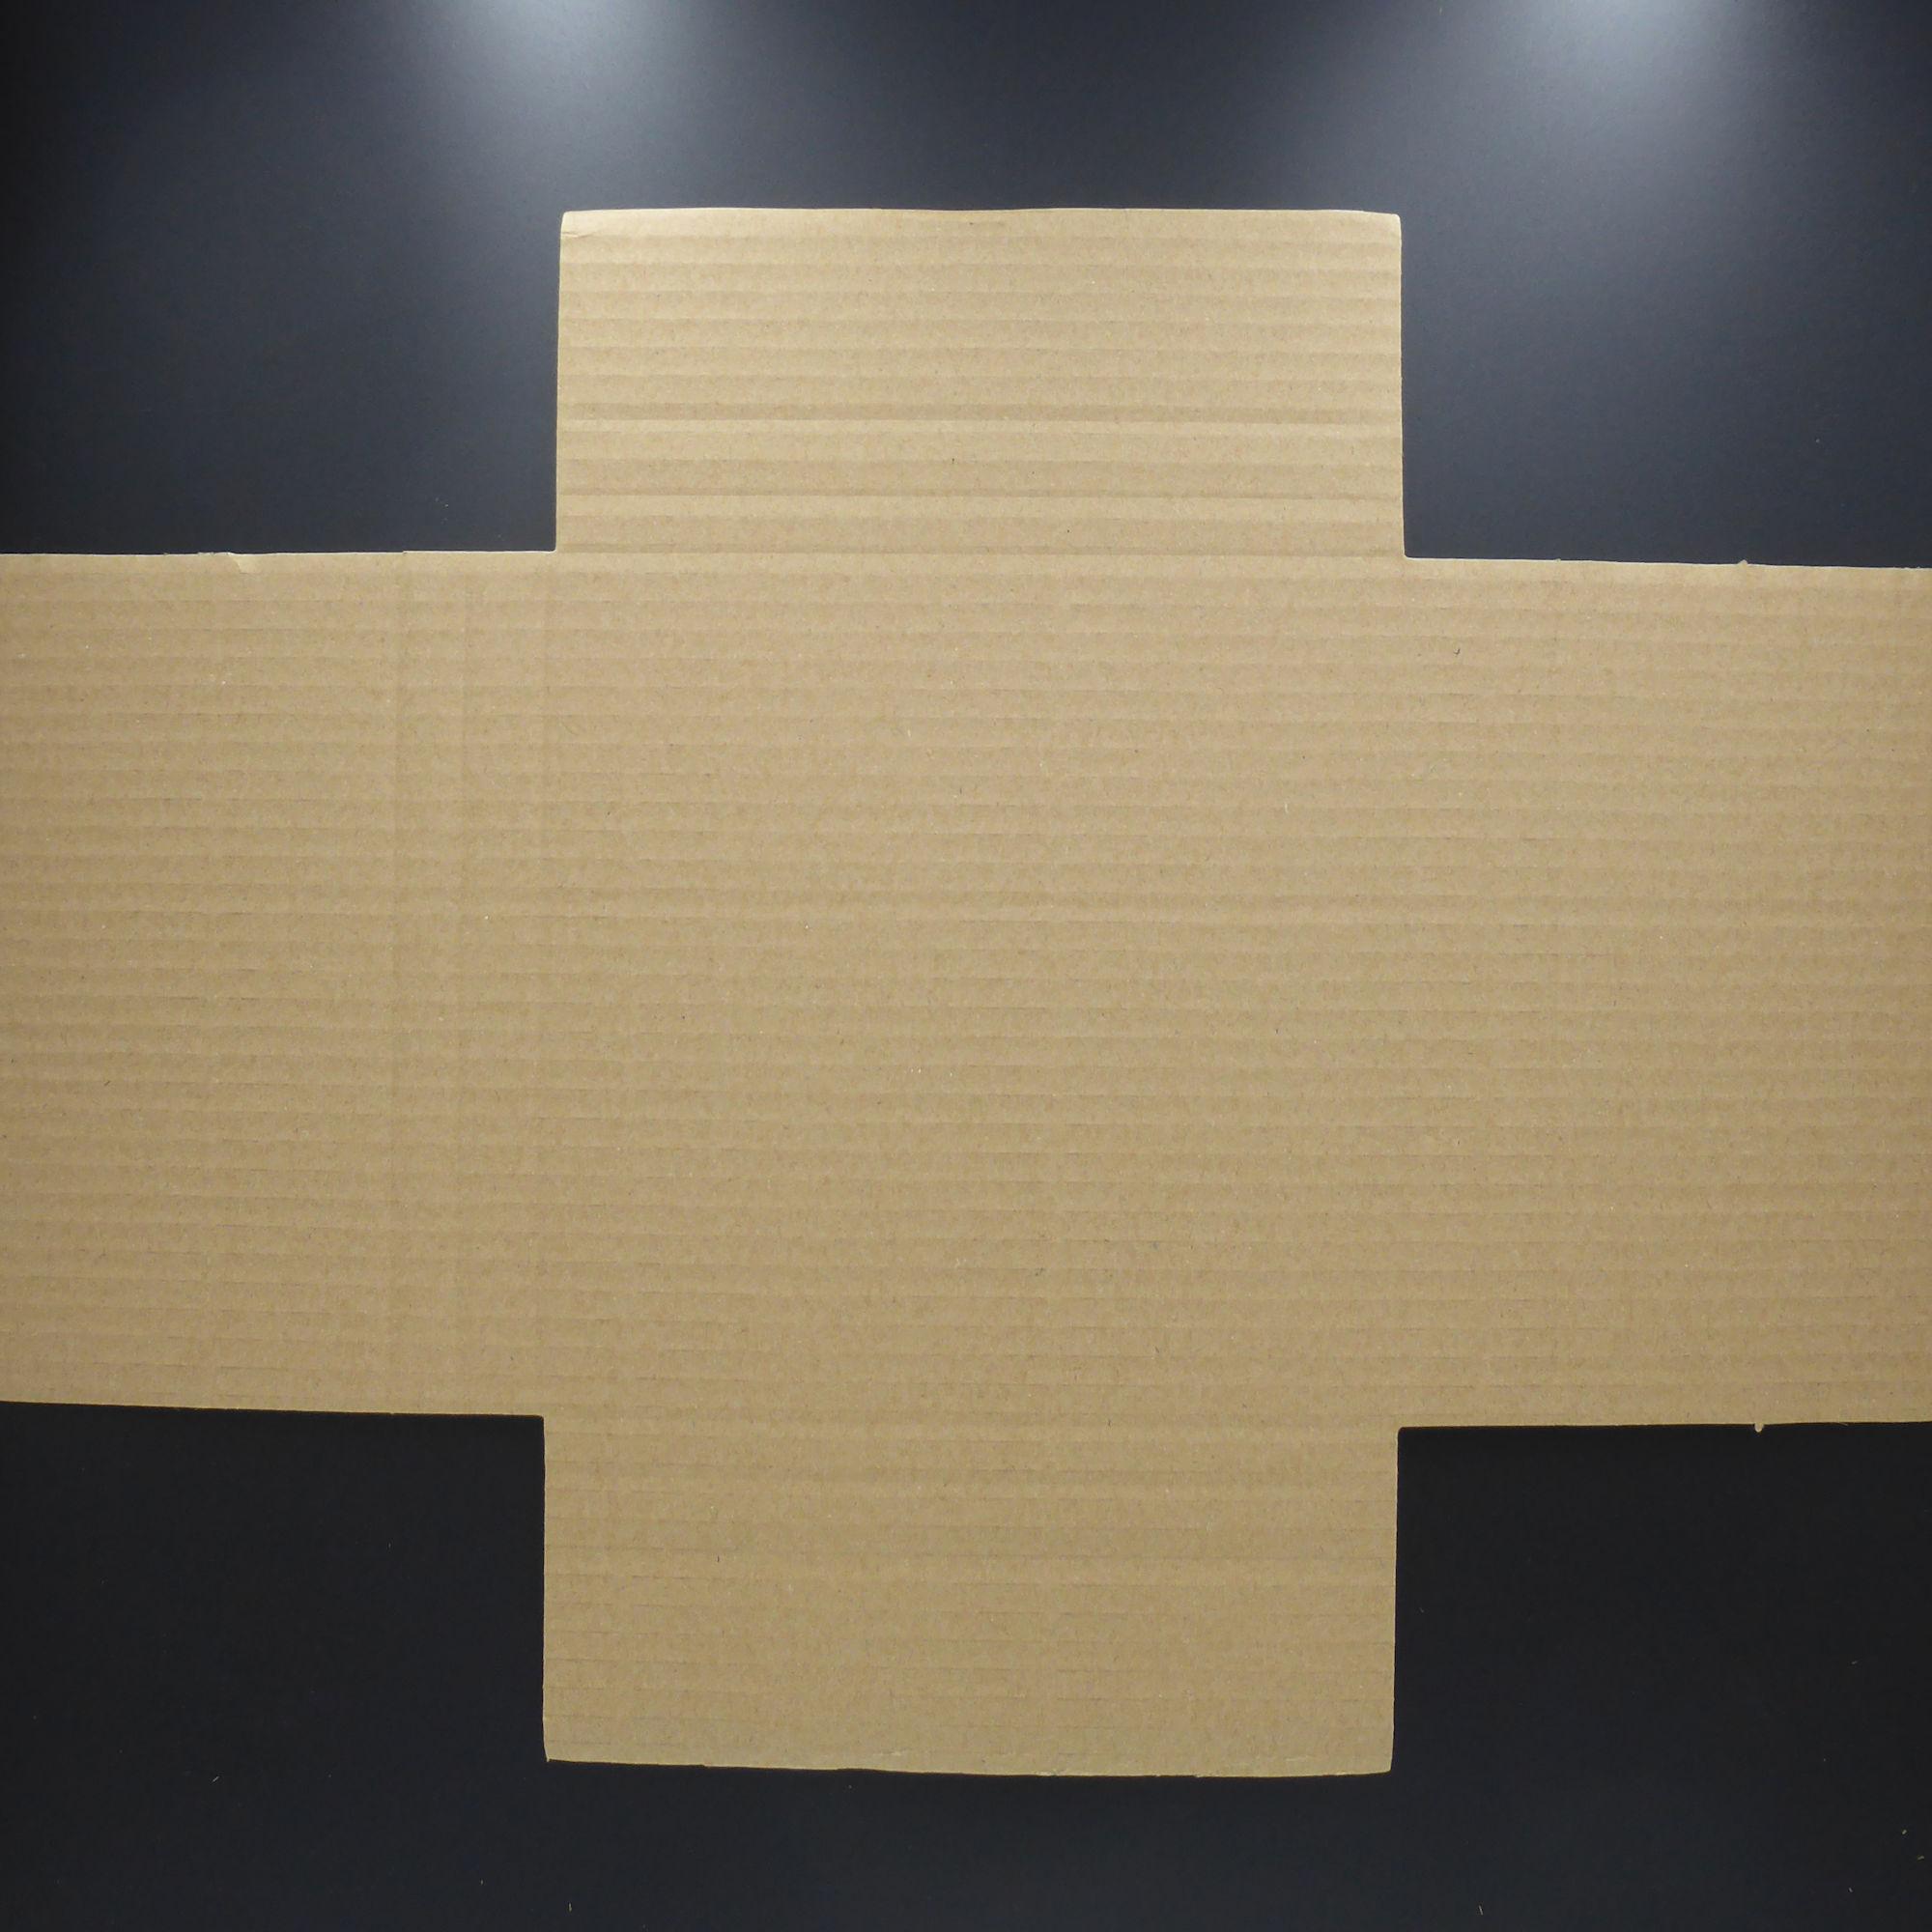 7 Quot Cardboard Cruciform Vinyl Record Mailer Holds Multiple